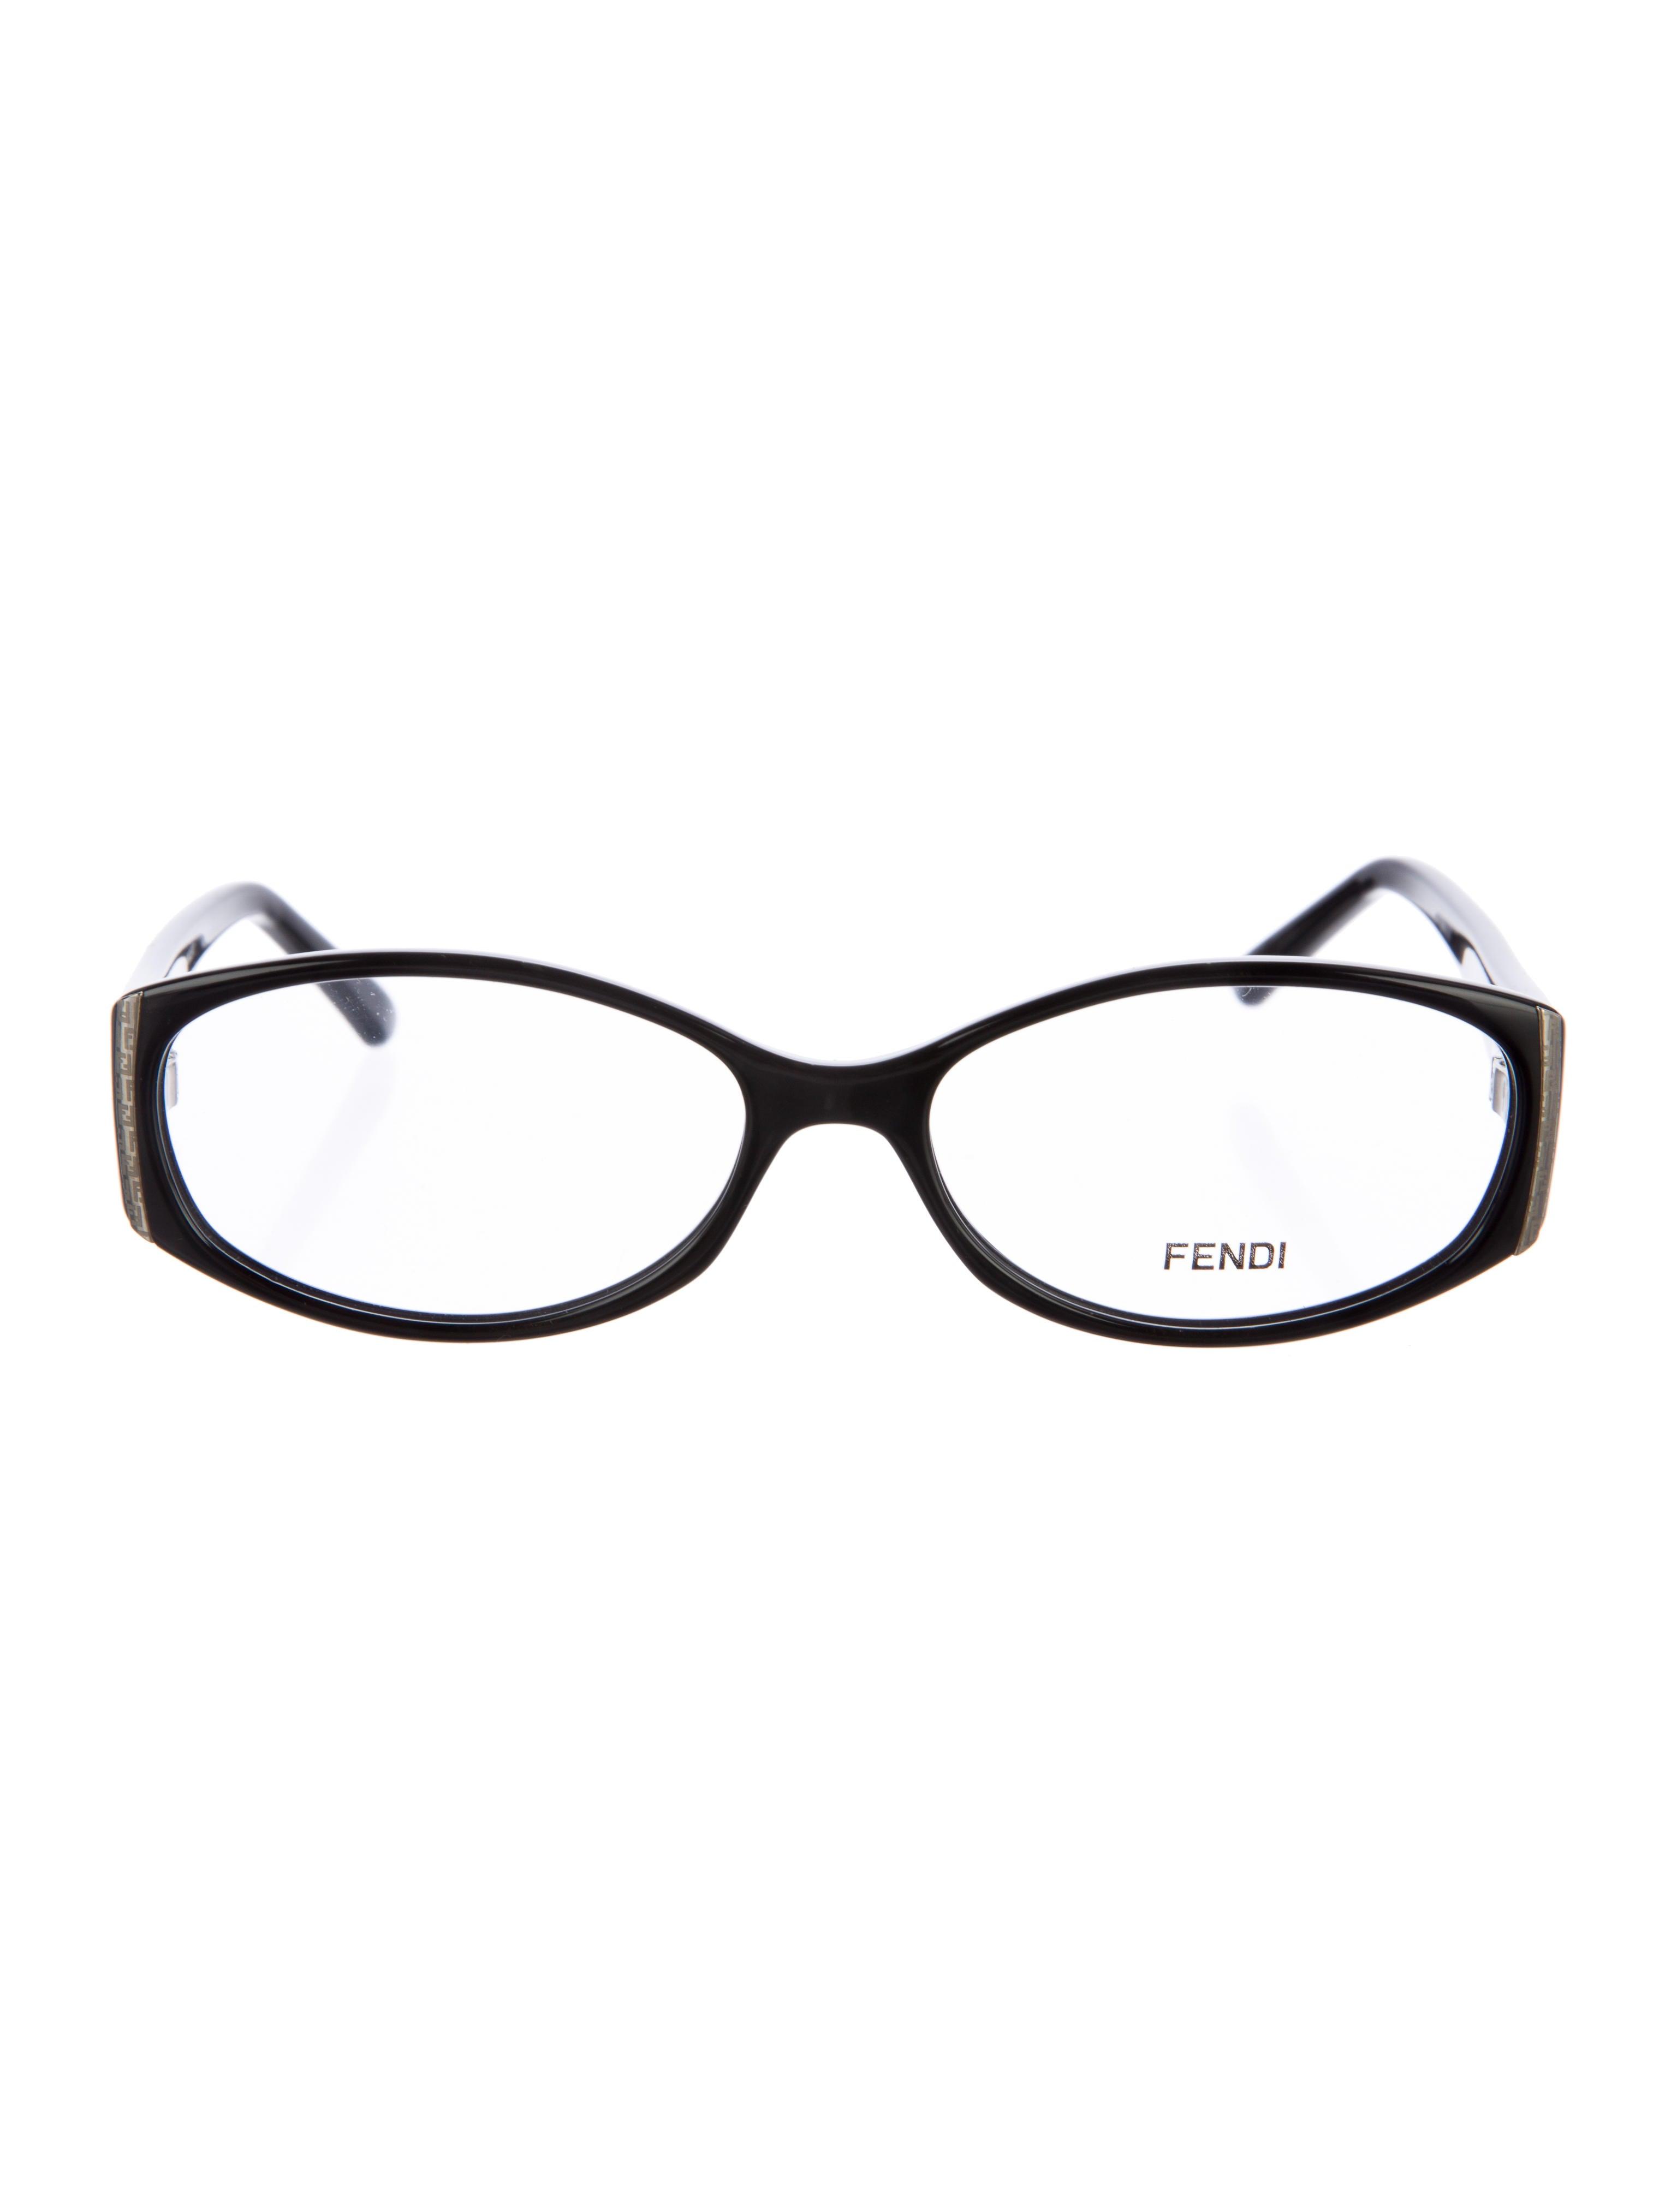 4e0781d6c3d9 Fendi Eye Glasses With Rhinestones